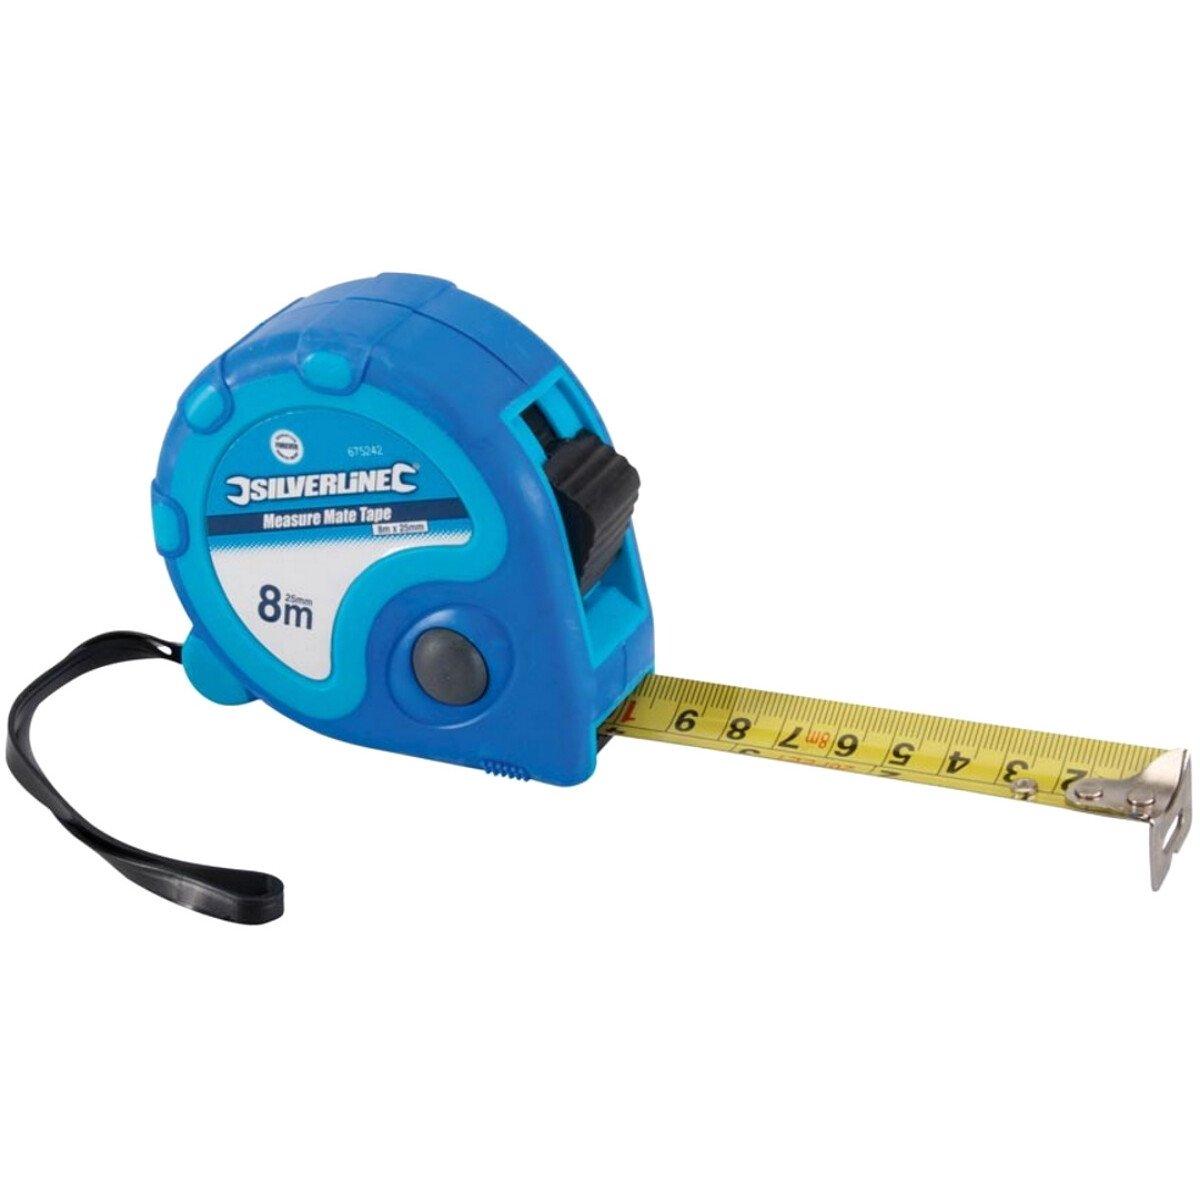 Silverline 675126 Measure Mate - 8m (26¼ft) Tape Measure